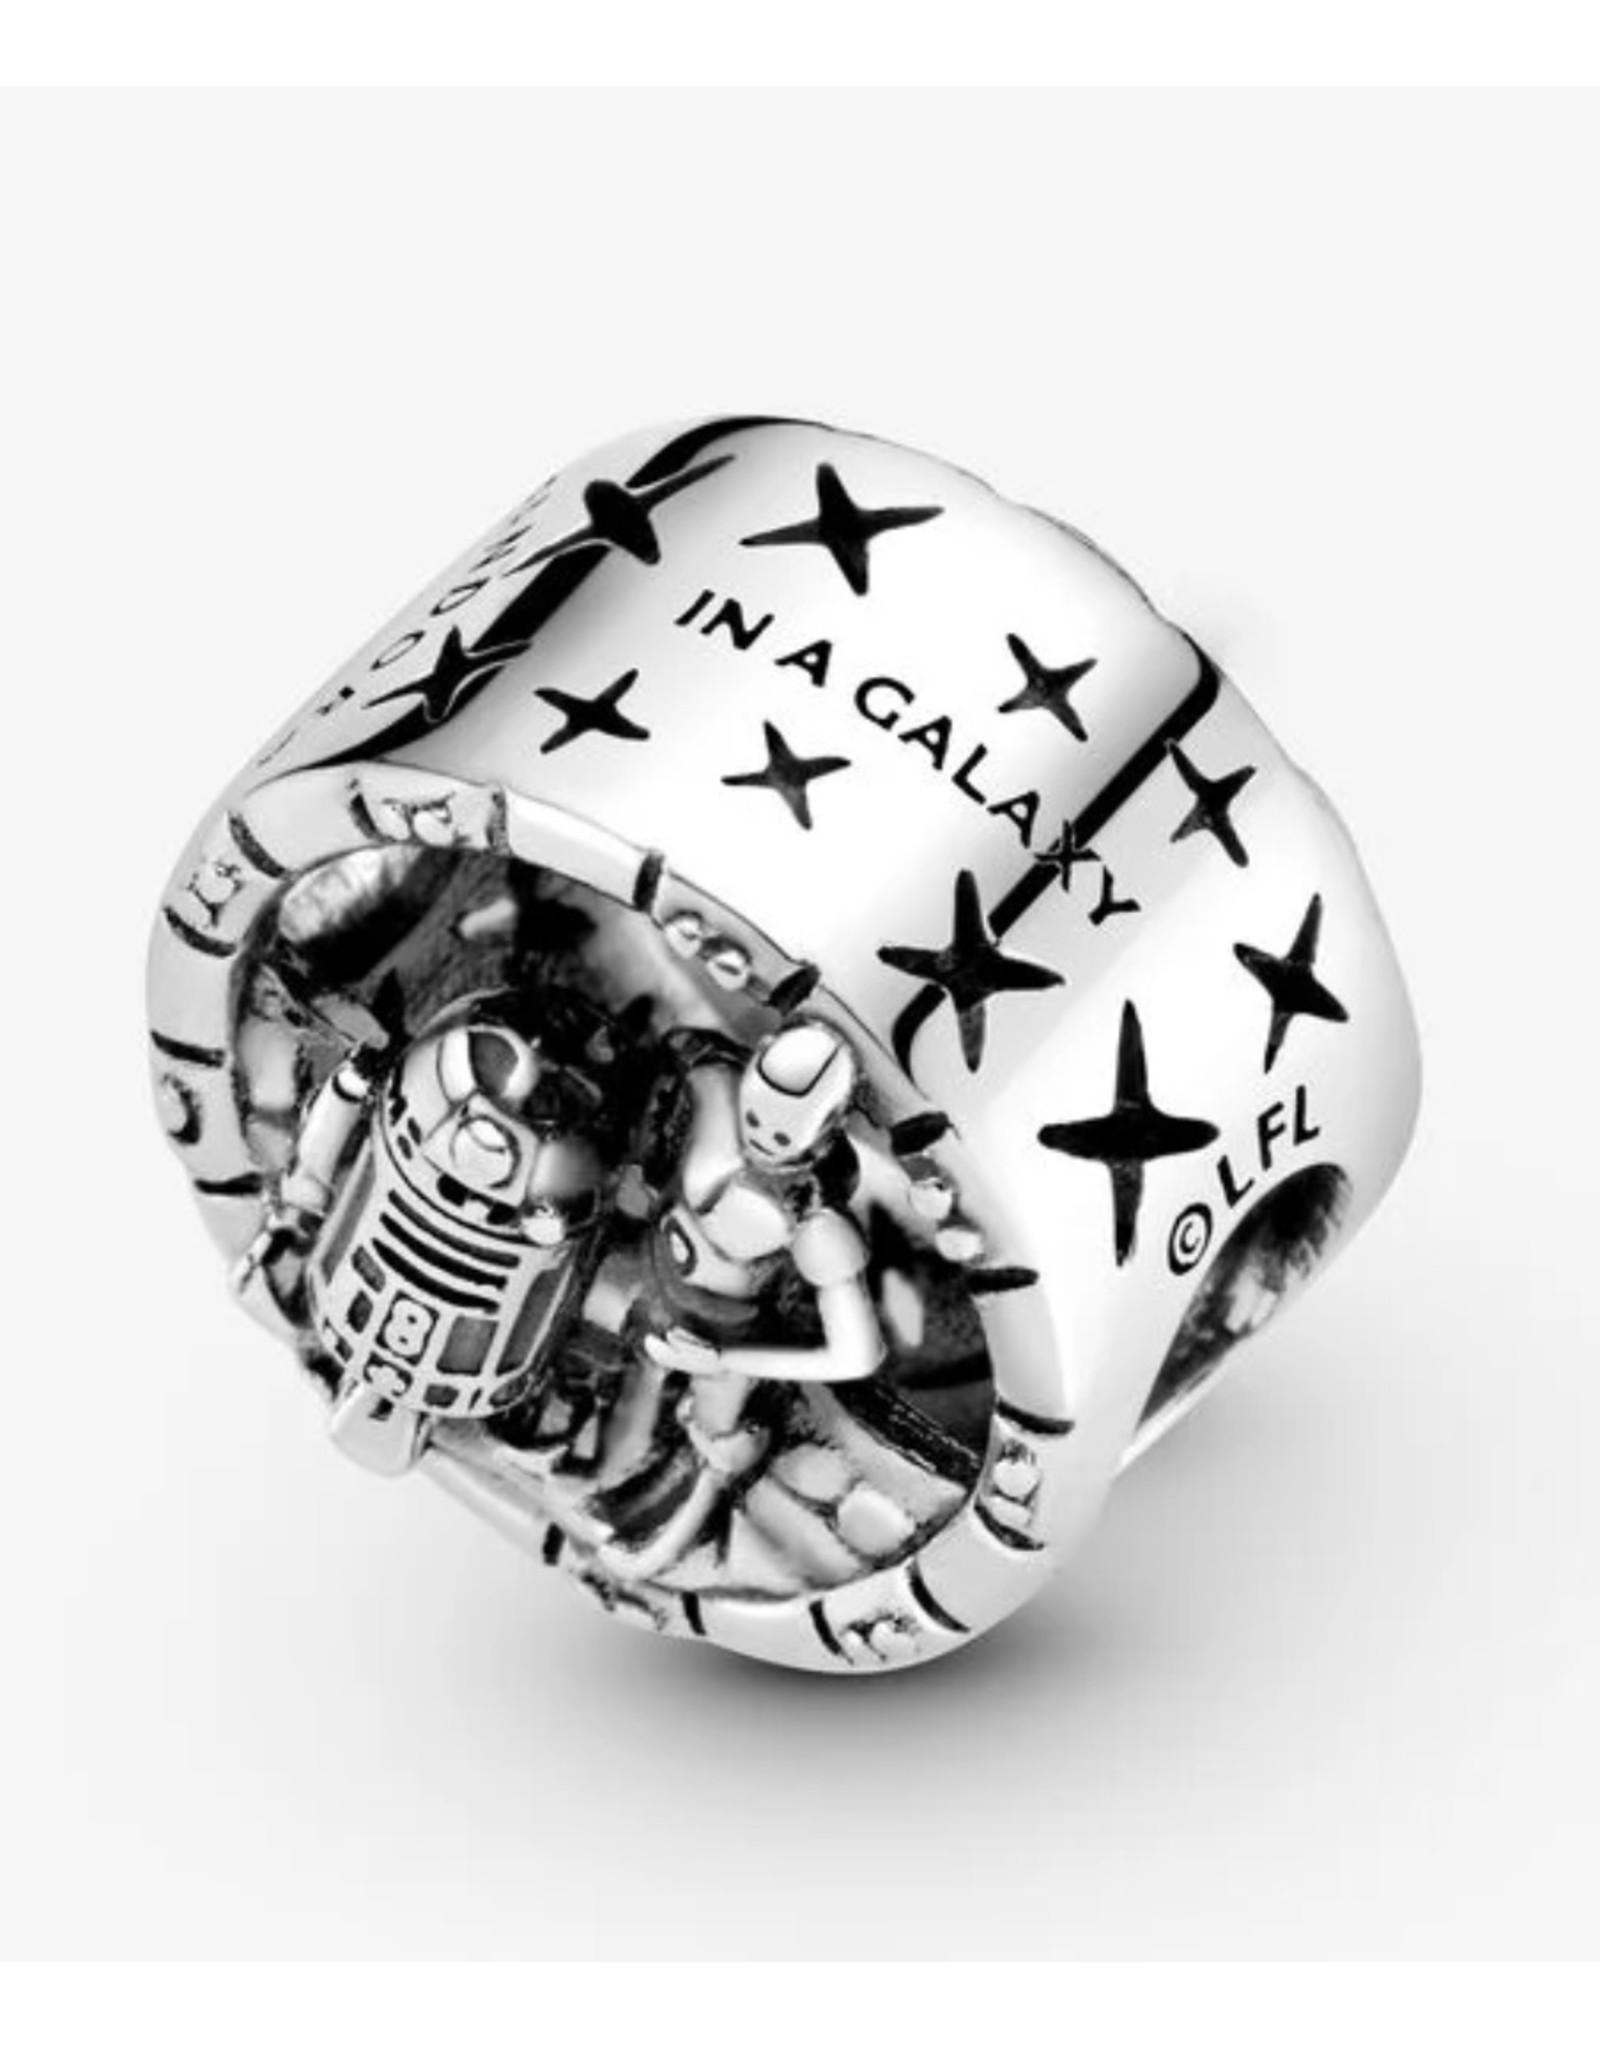 Pandora Pandora Charm, 799245C00, Star Wars C-3PO & R2-D2